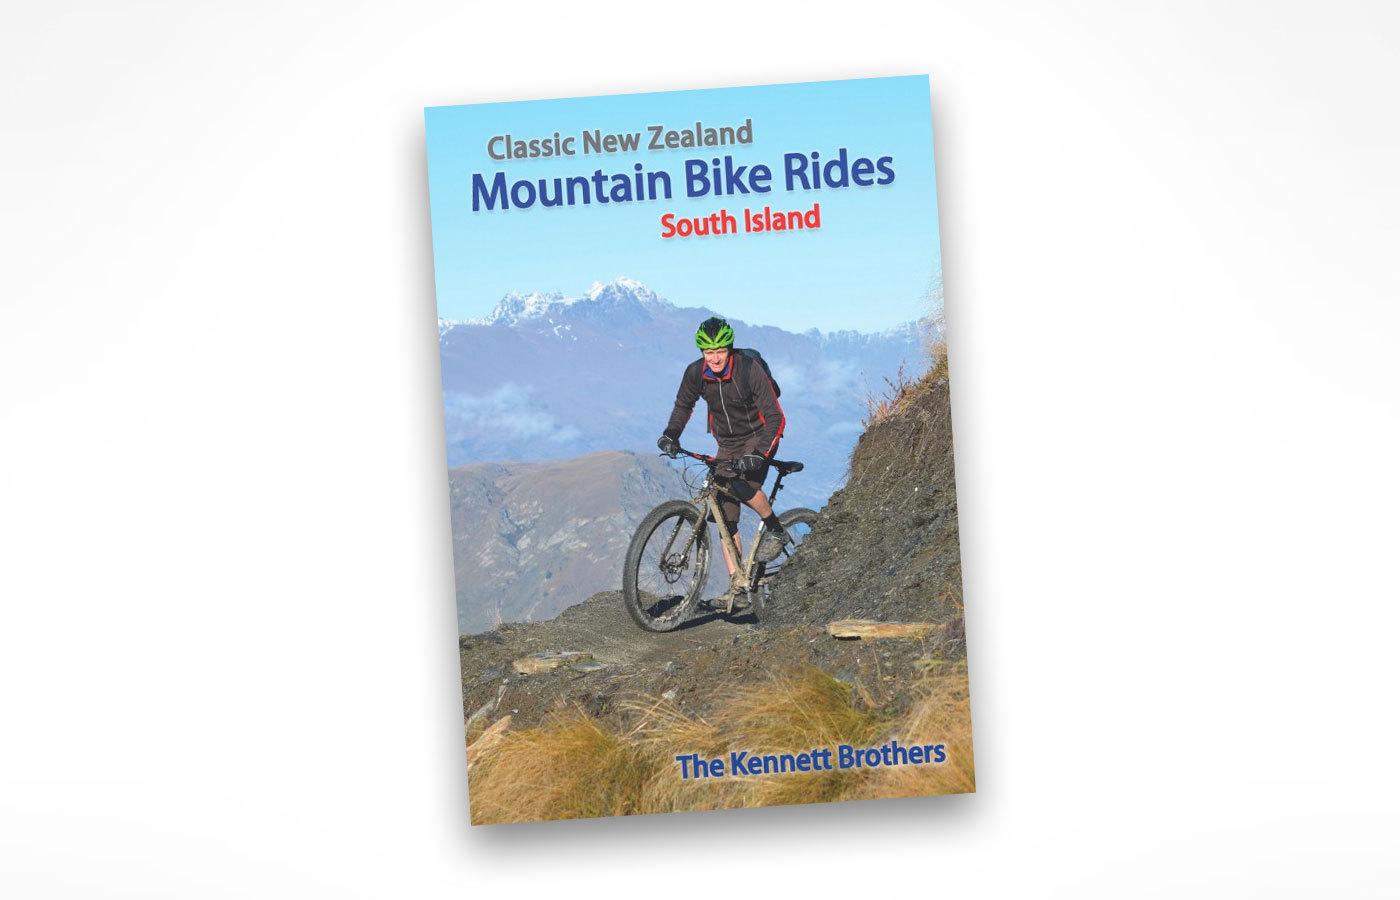 Classic New Zealand Mountain Bike Rides South Island